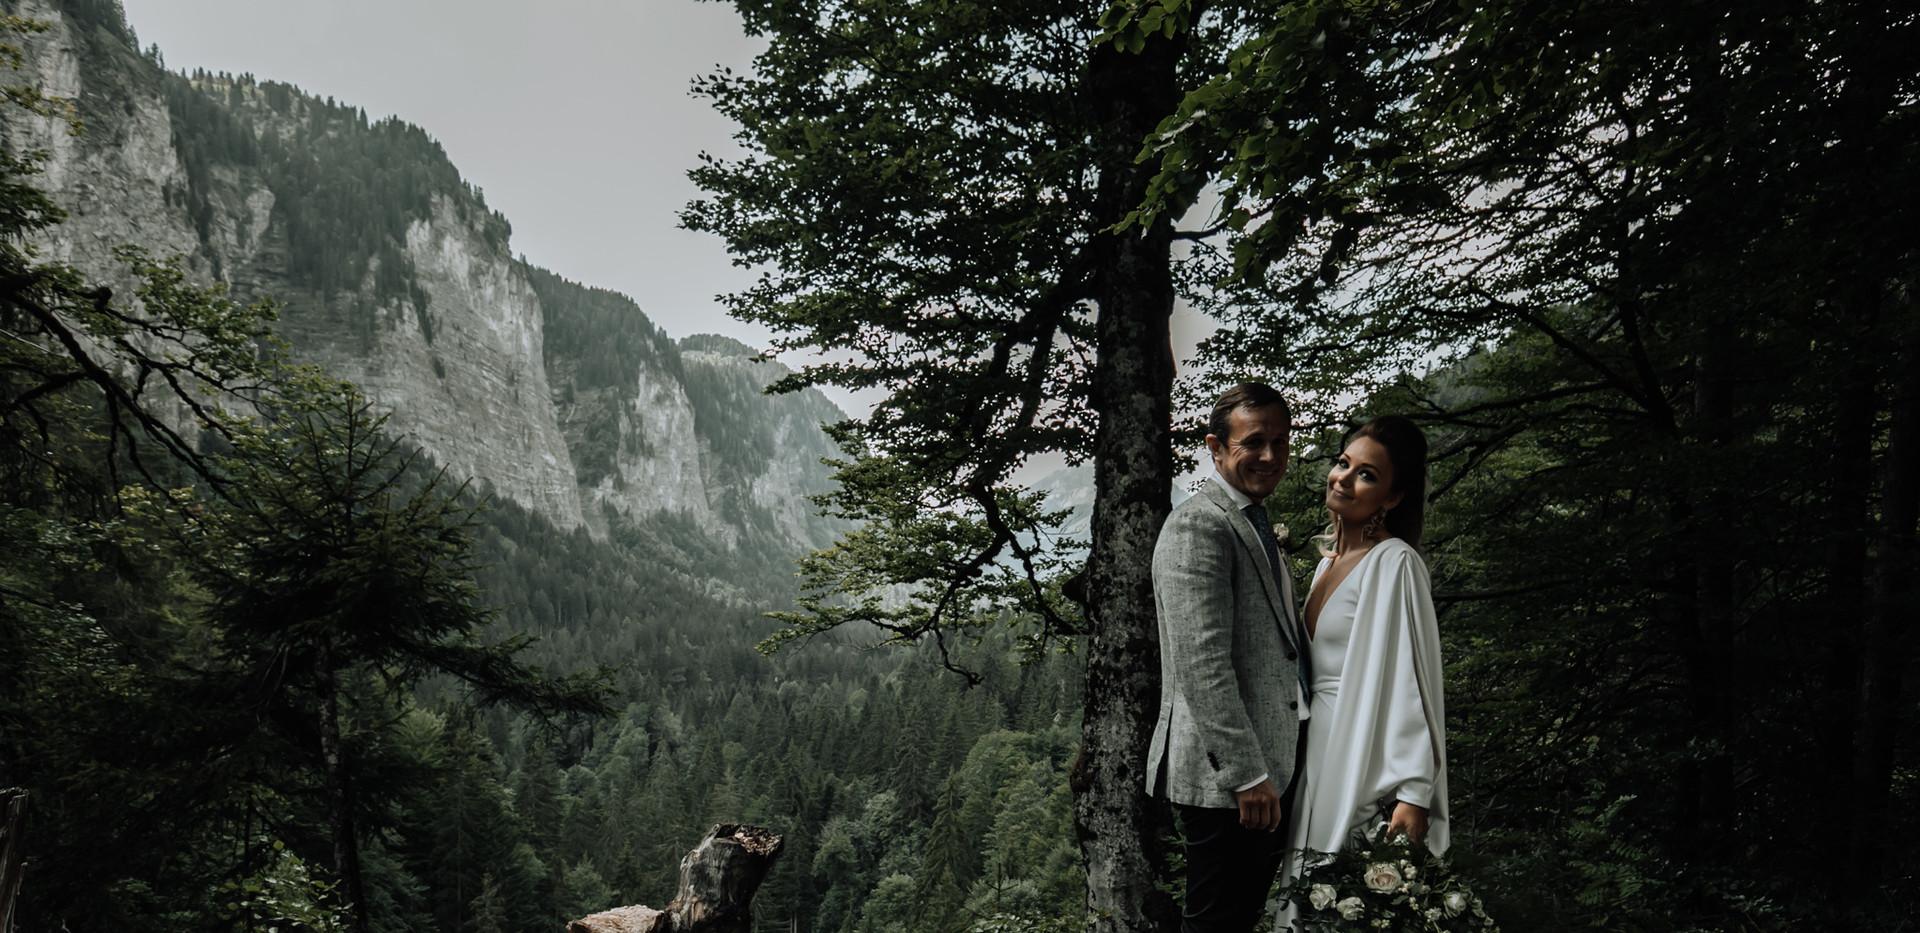 Mountain top photo with wedding couple